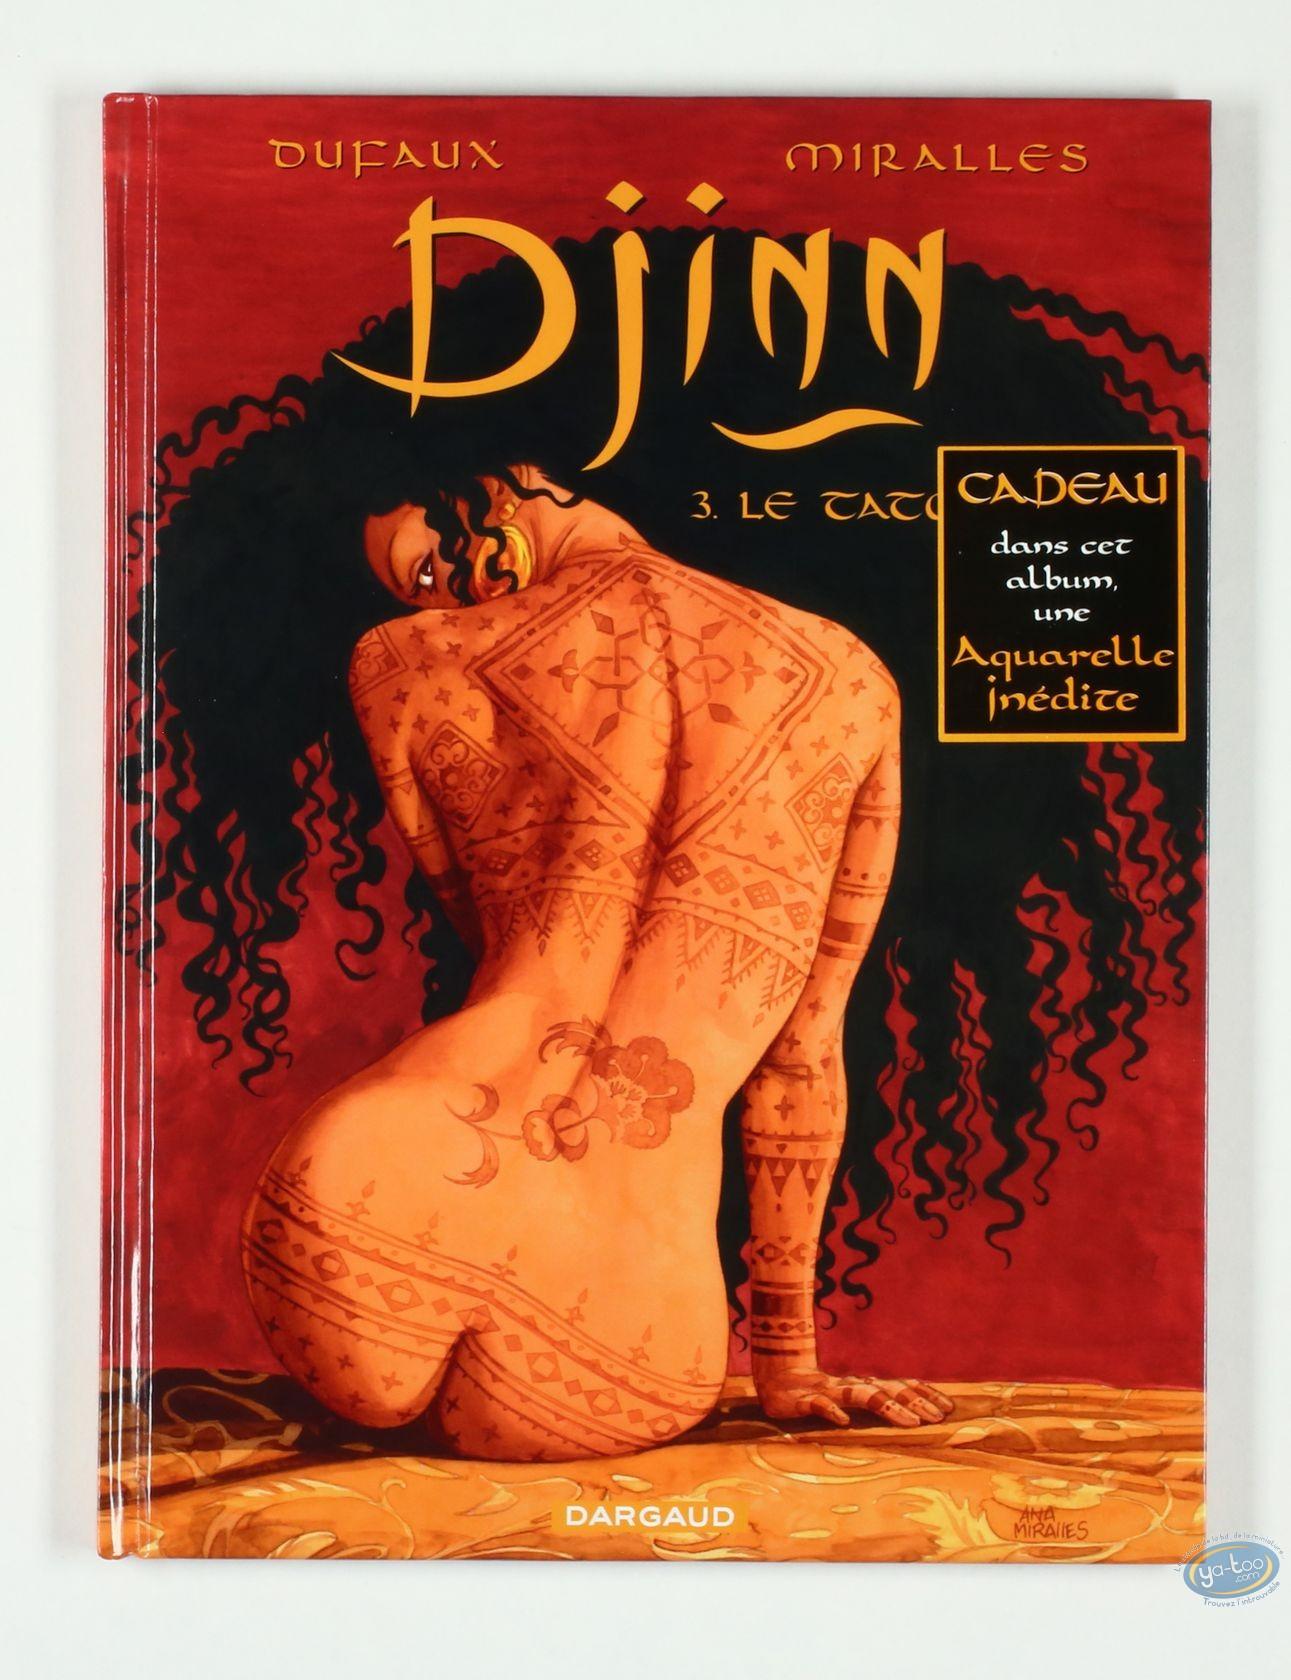 Listed European Comic Books, Djinn : Le Tresor (very good condition)